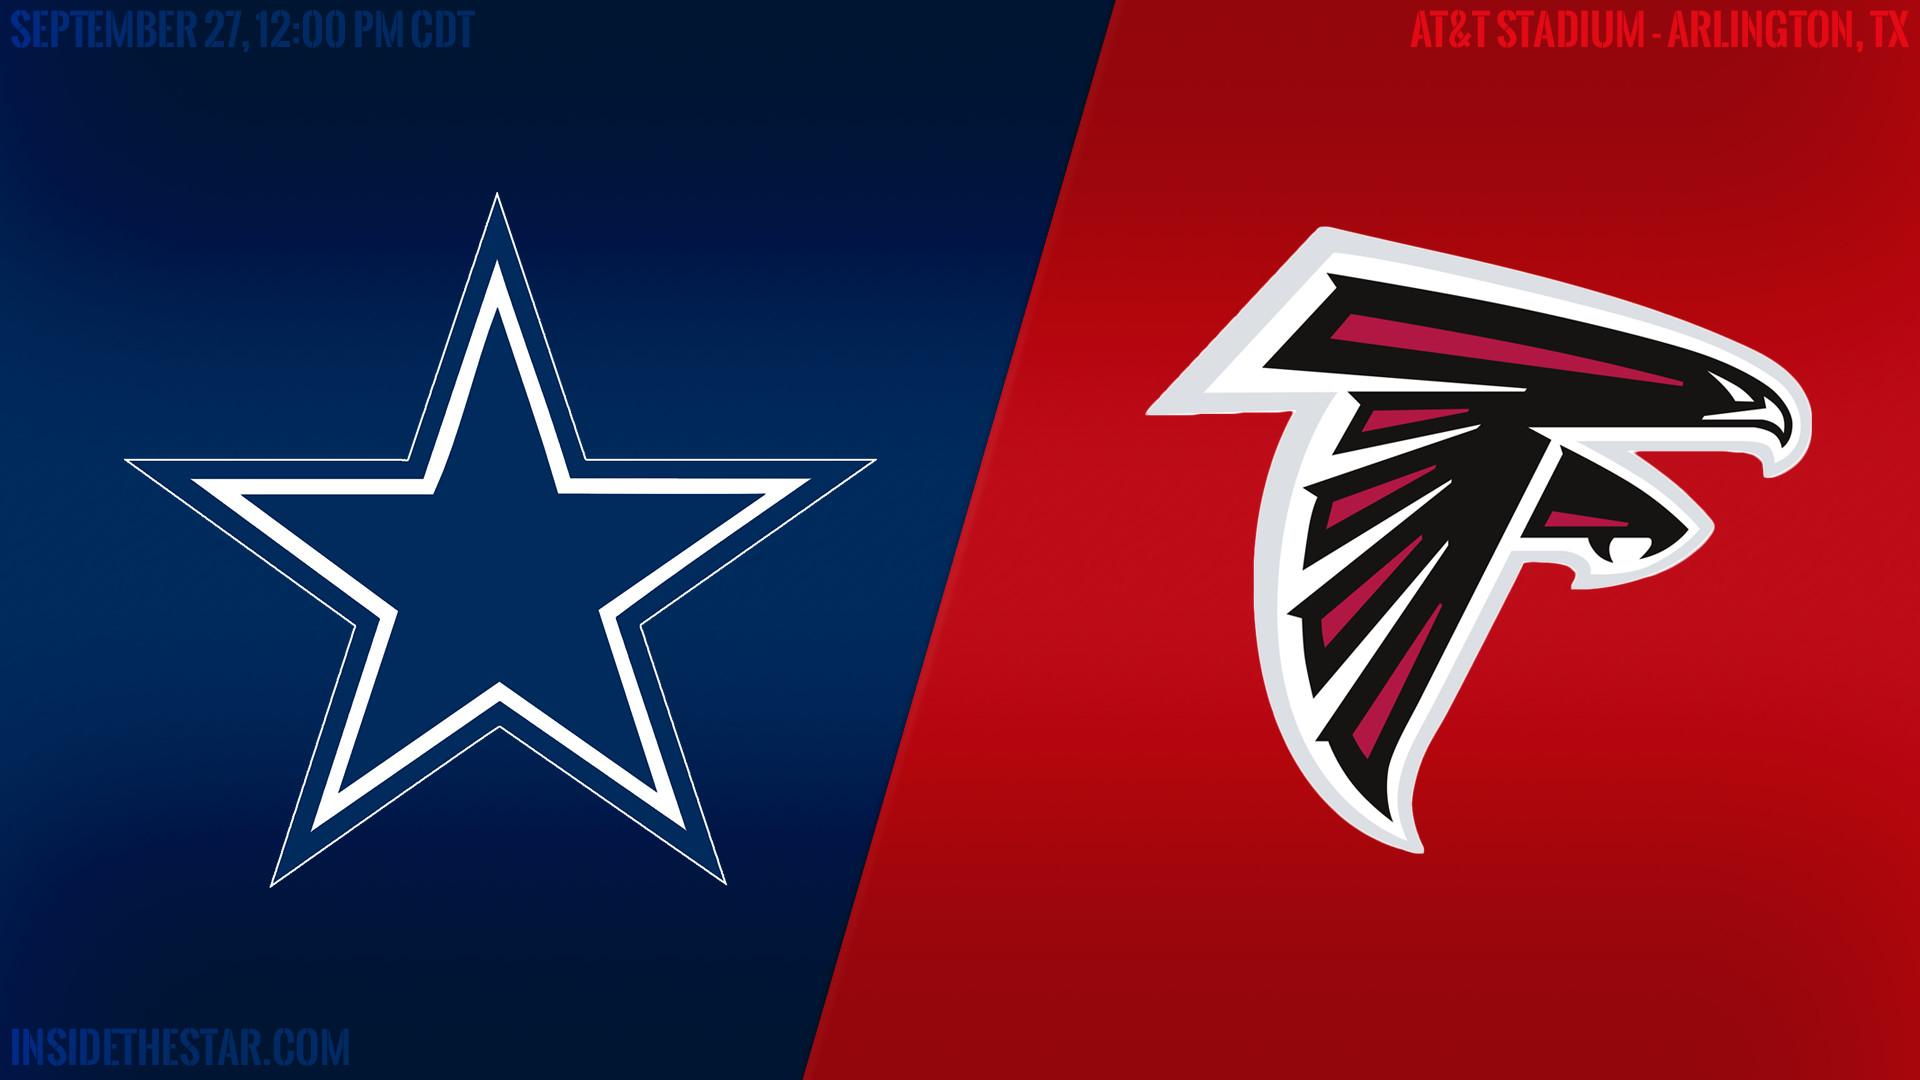 Cowboys Blog – #SmoothView Pregame Report: Dallas Cowboys vs Atlanta Falcons